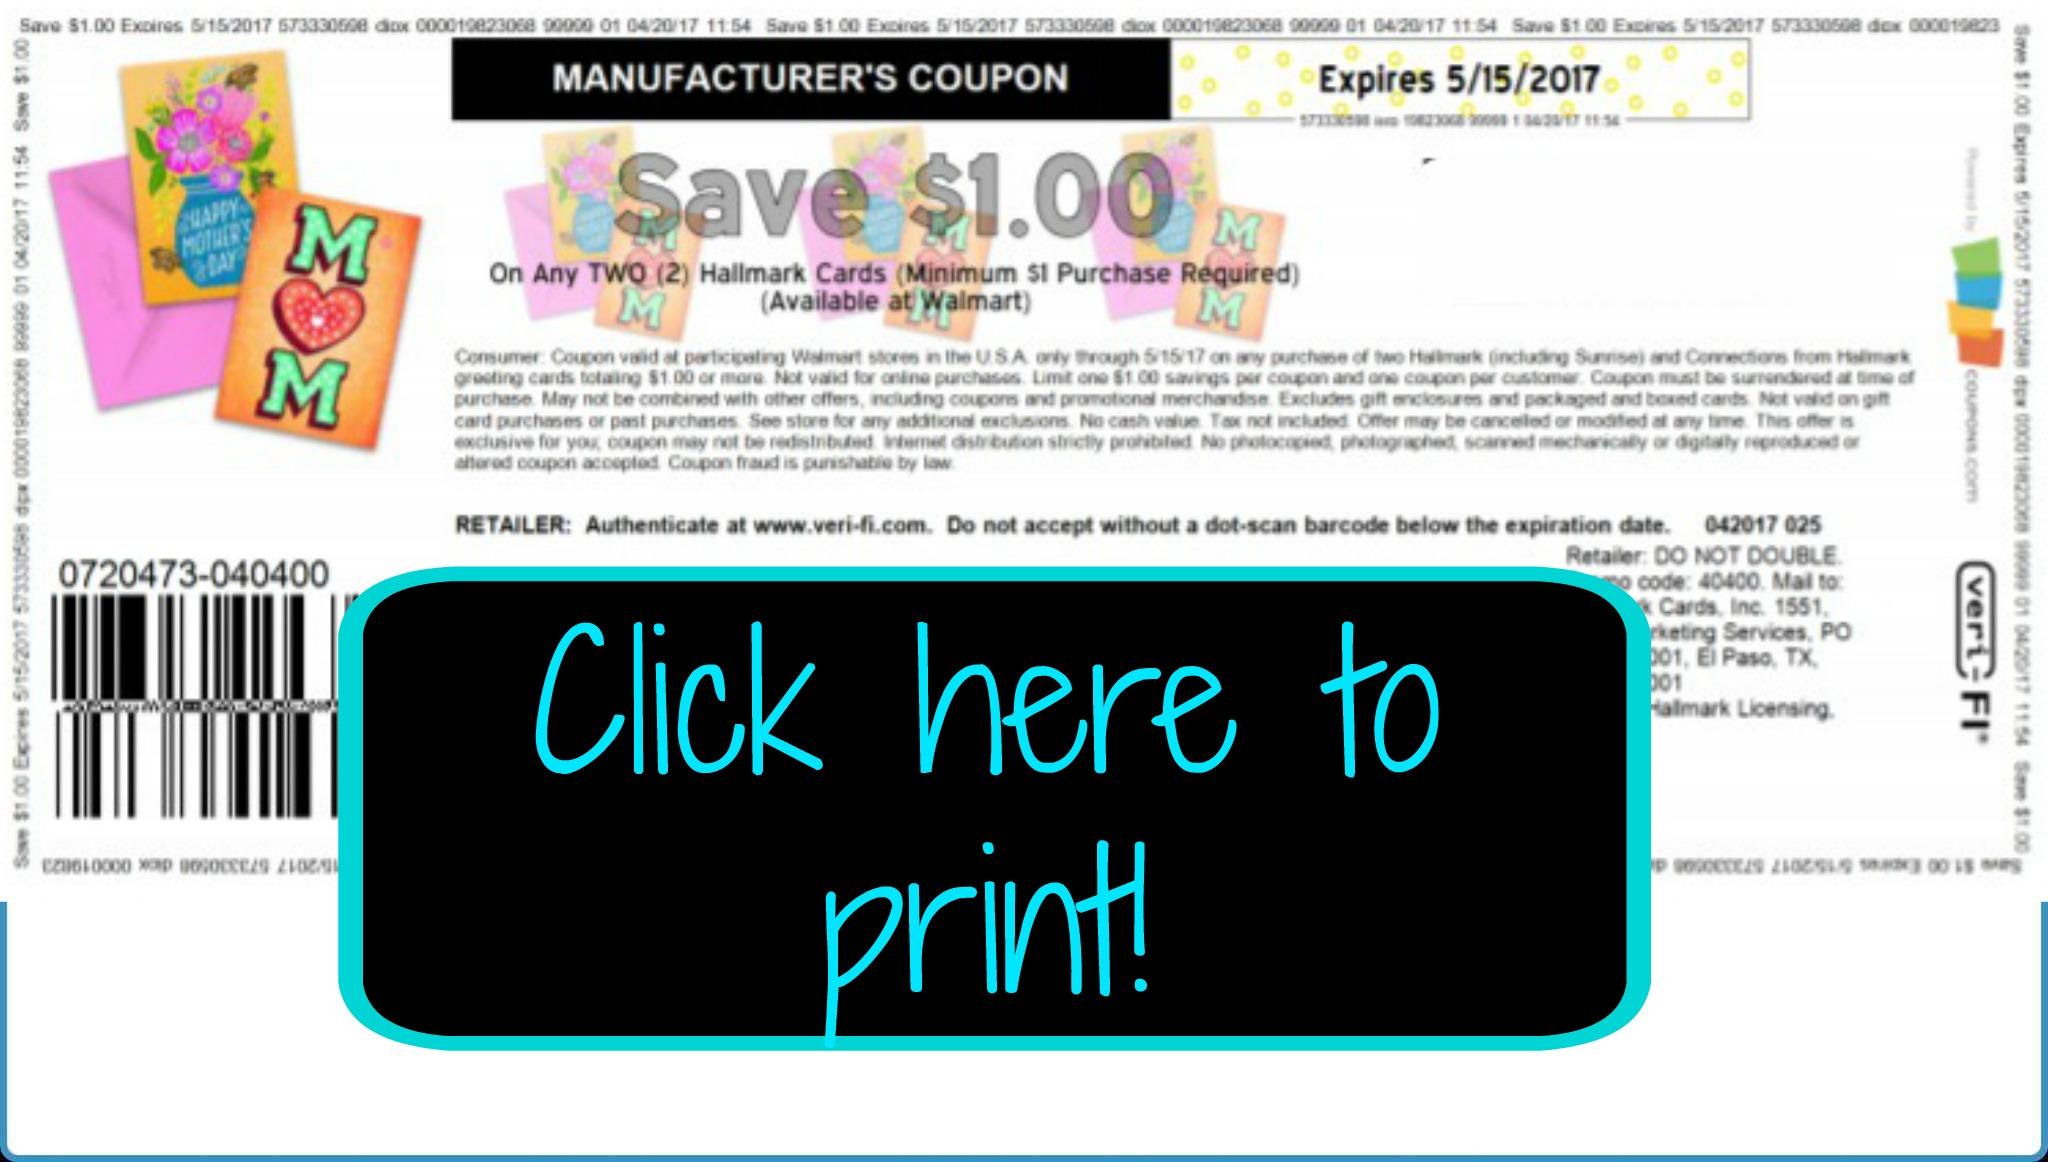 Hot rare 1 2 hallmark card coupon my publix coupon buddy publix couponing help made easy